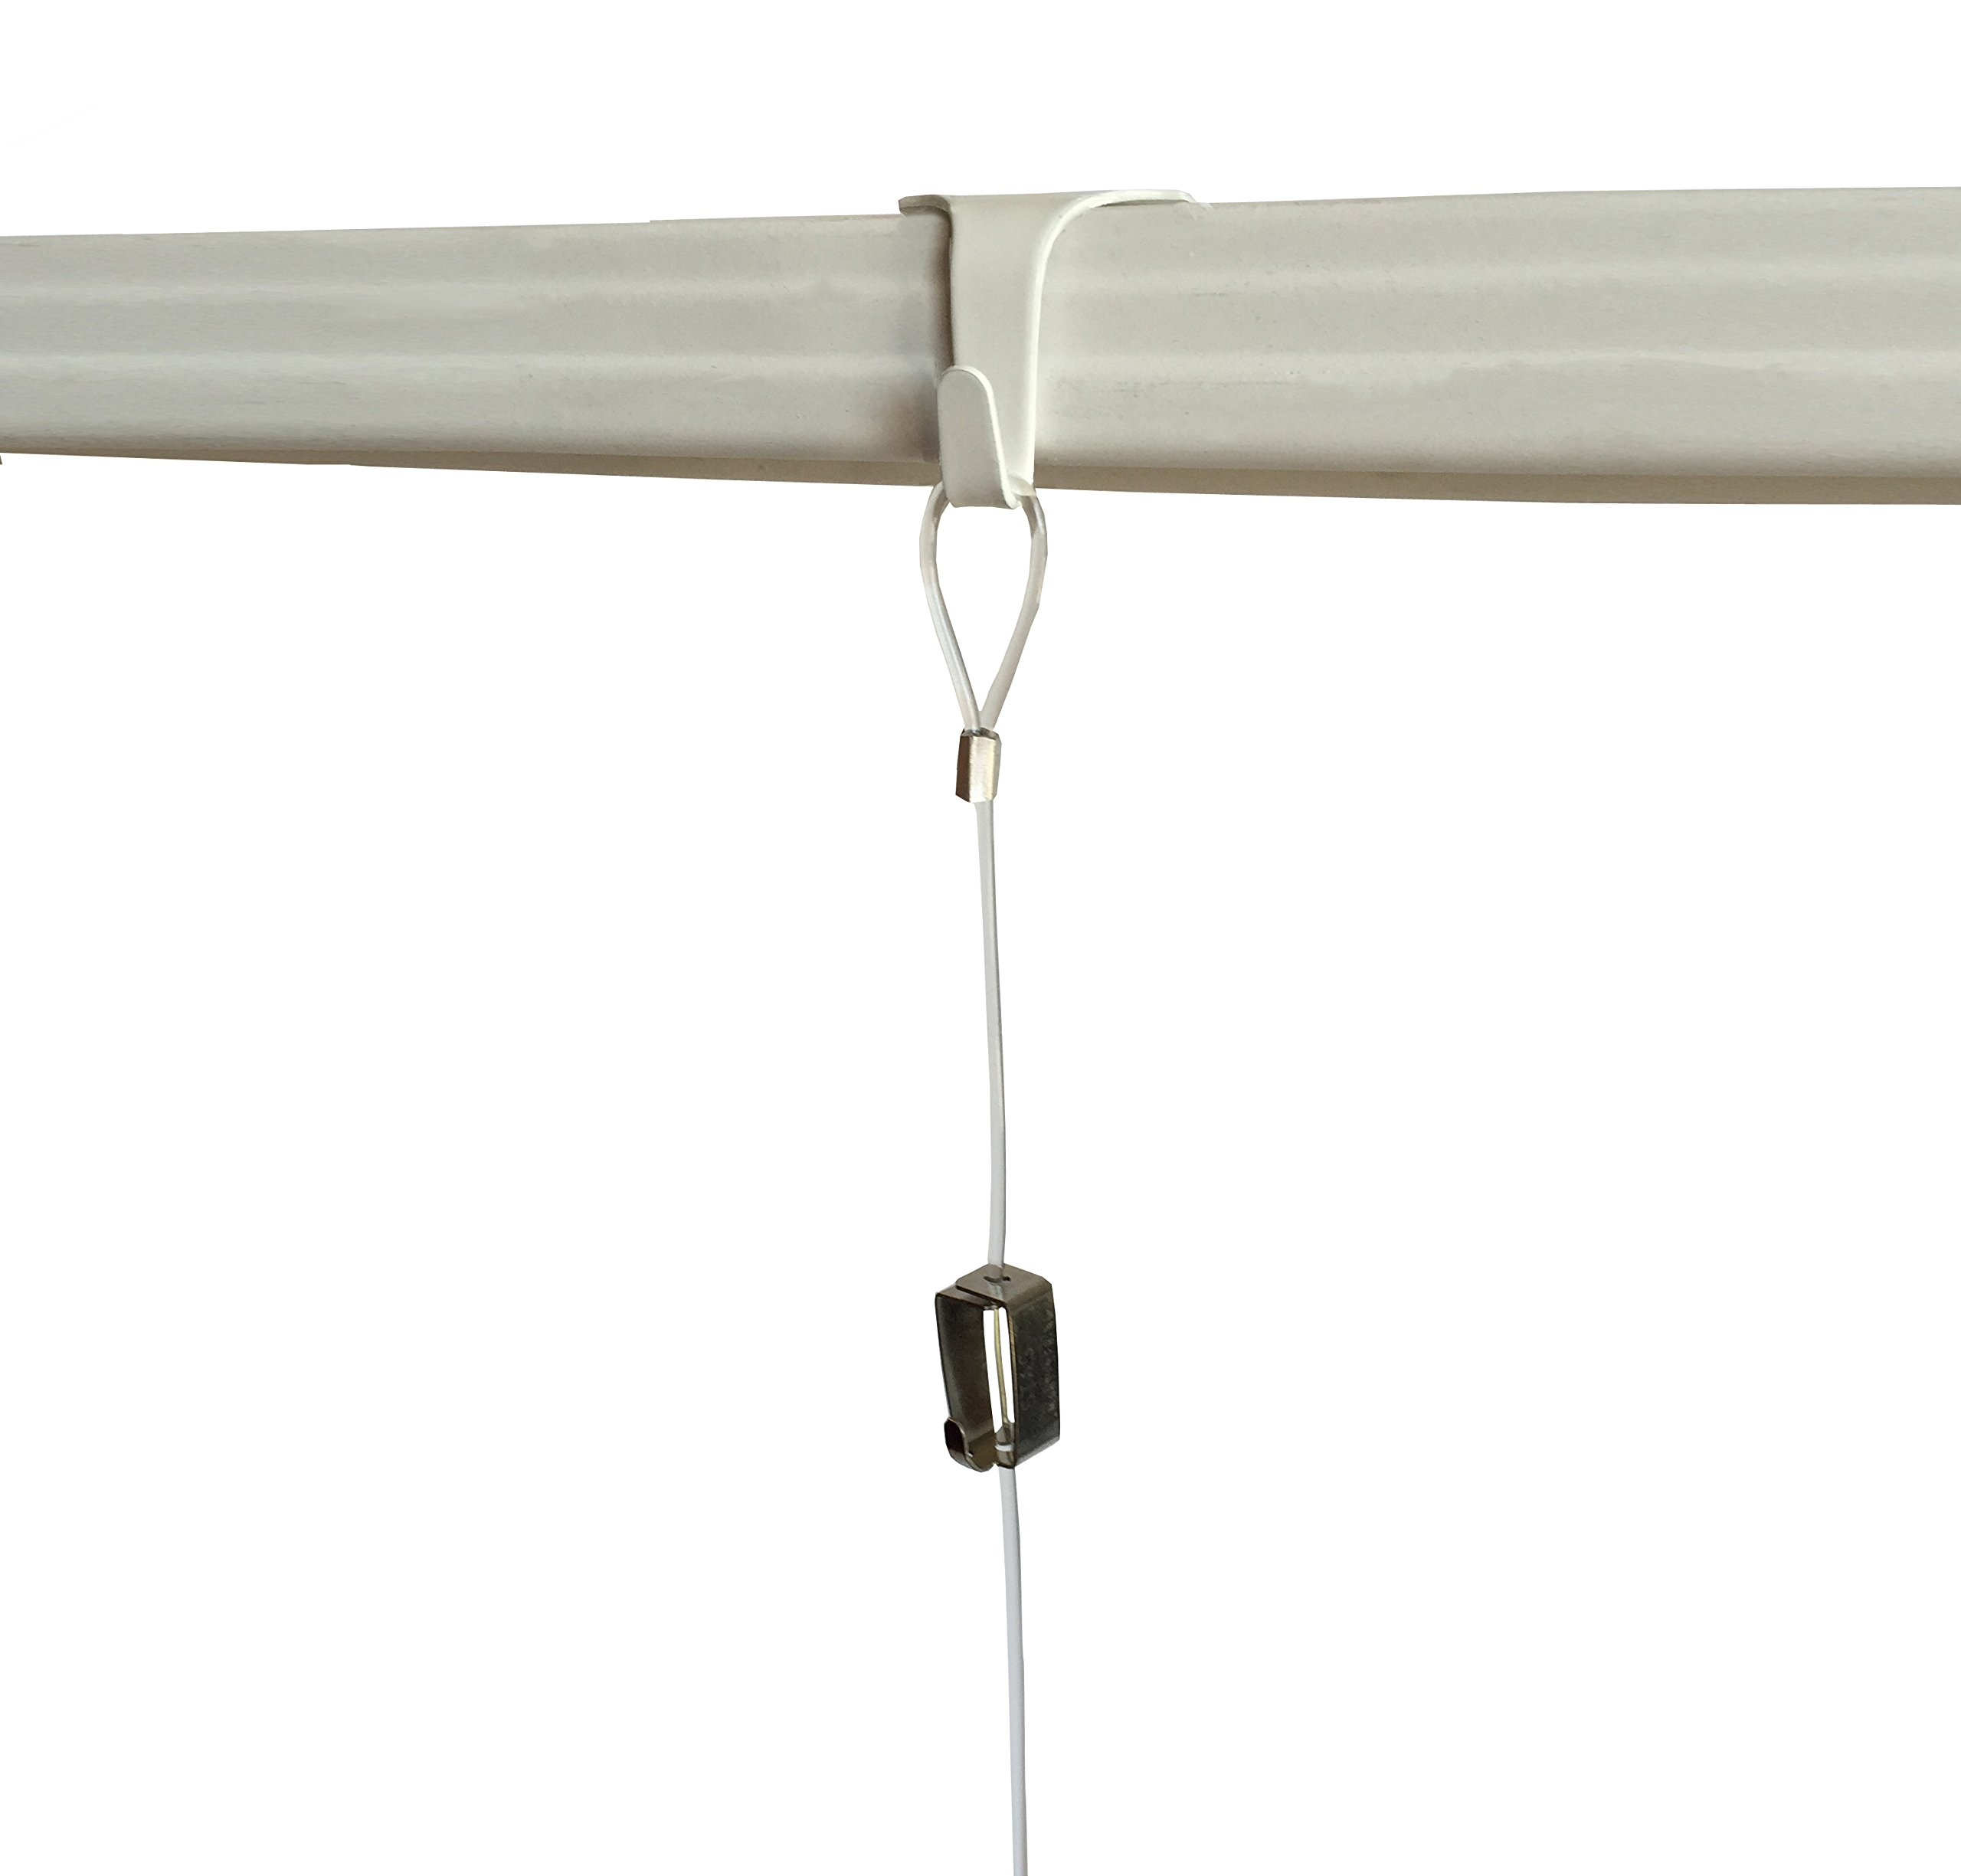 Multipack STAS Molding Hooks for picture rails (10, White)